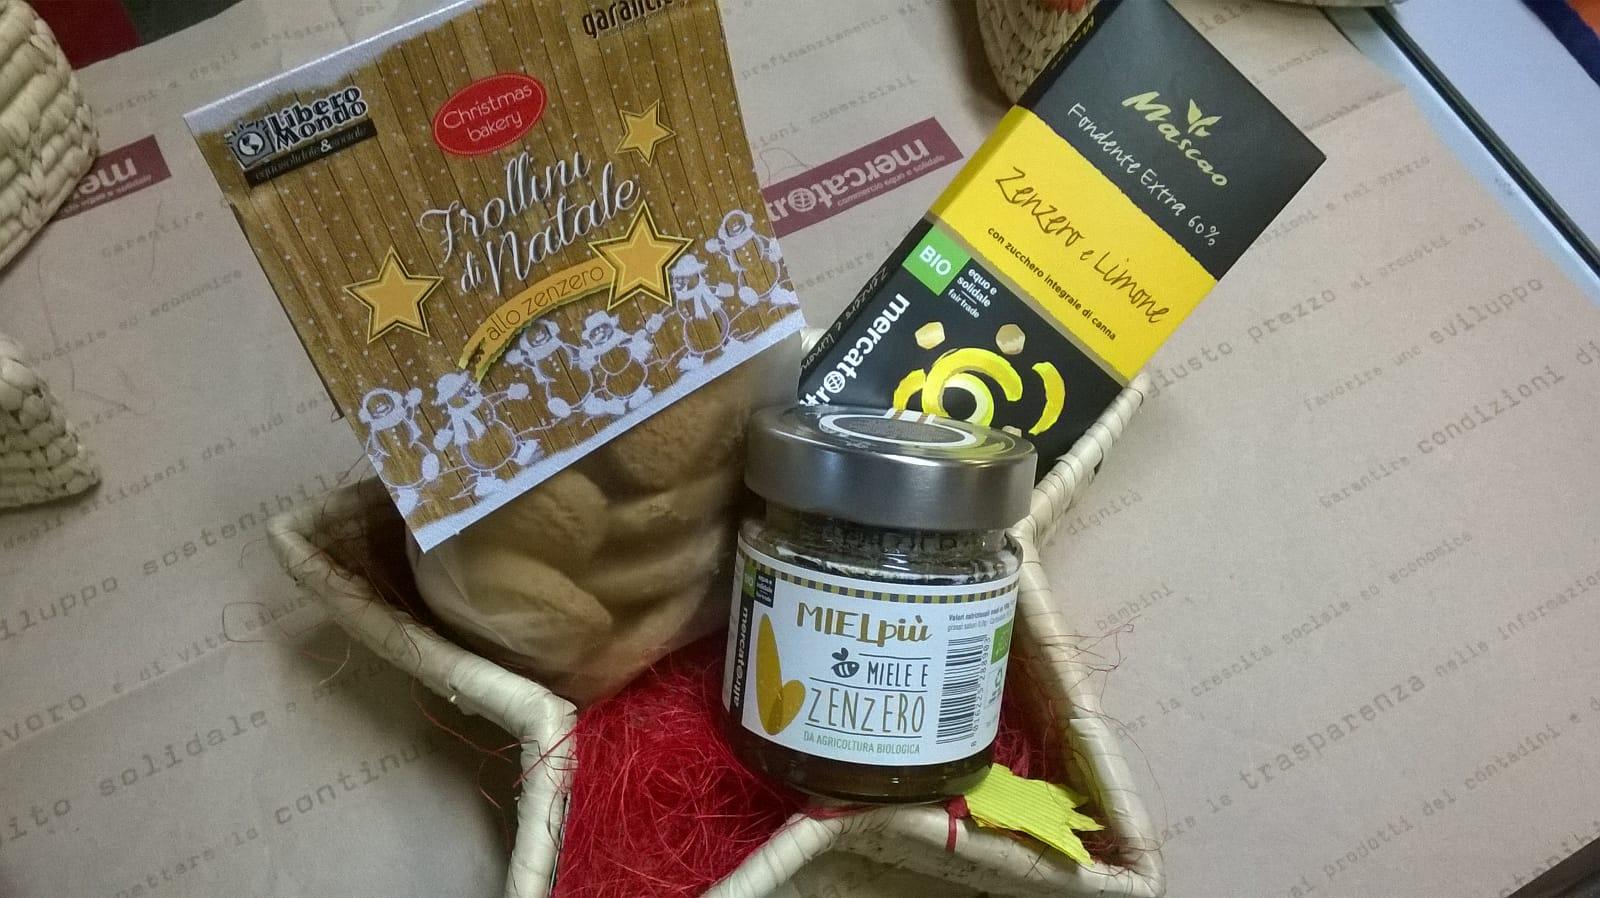 Natale regalo equosolidale10